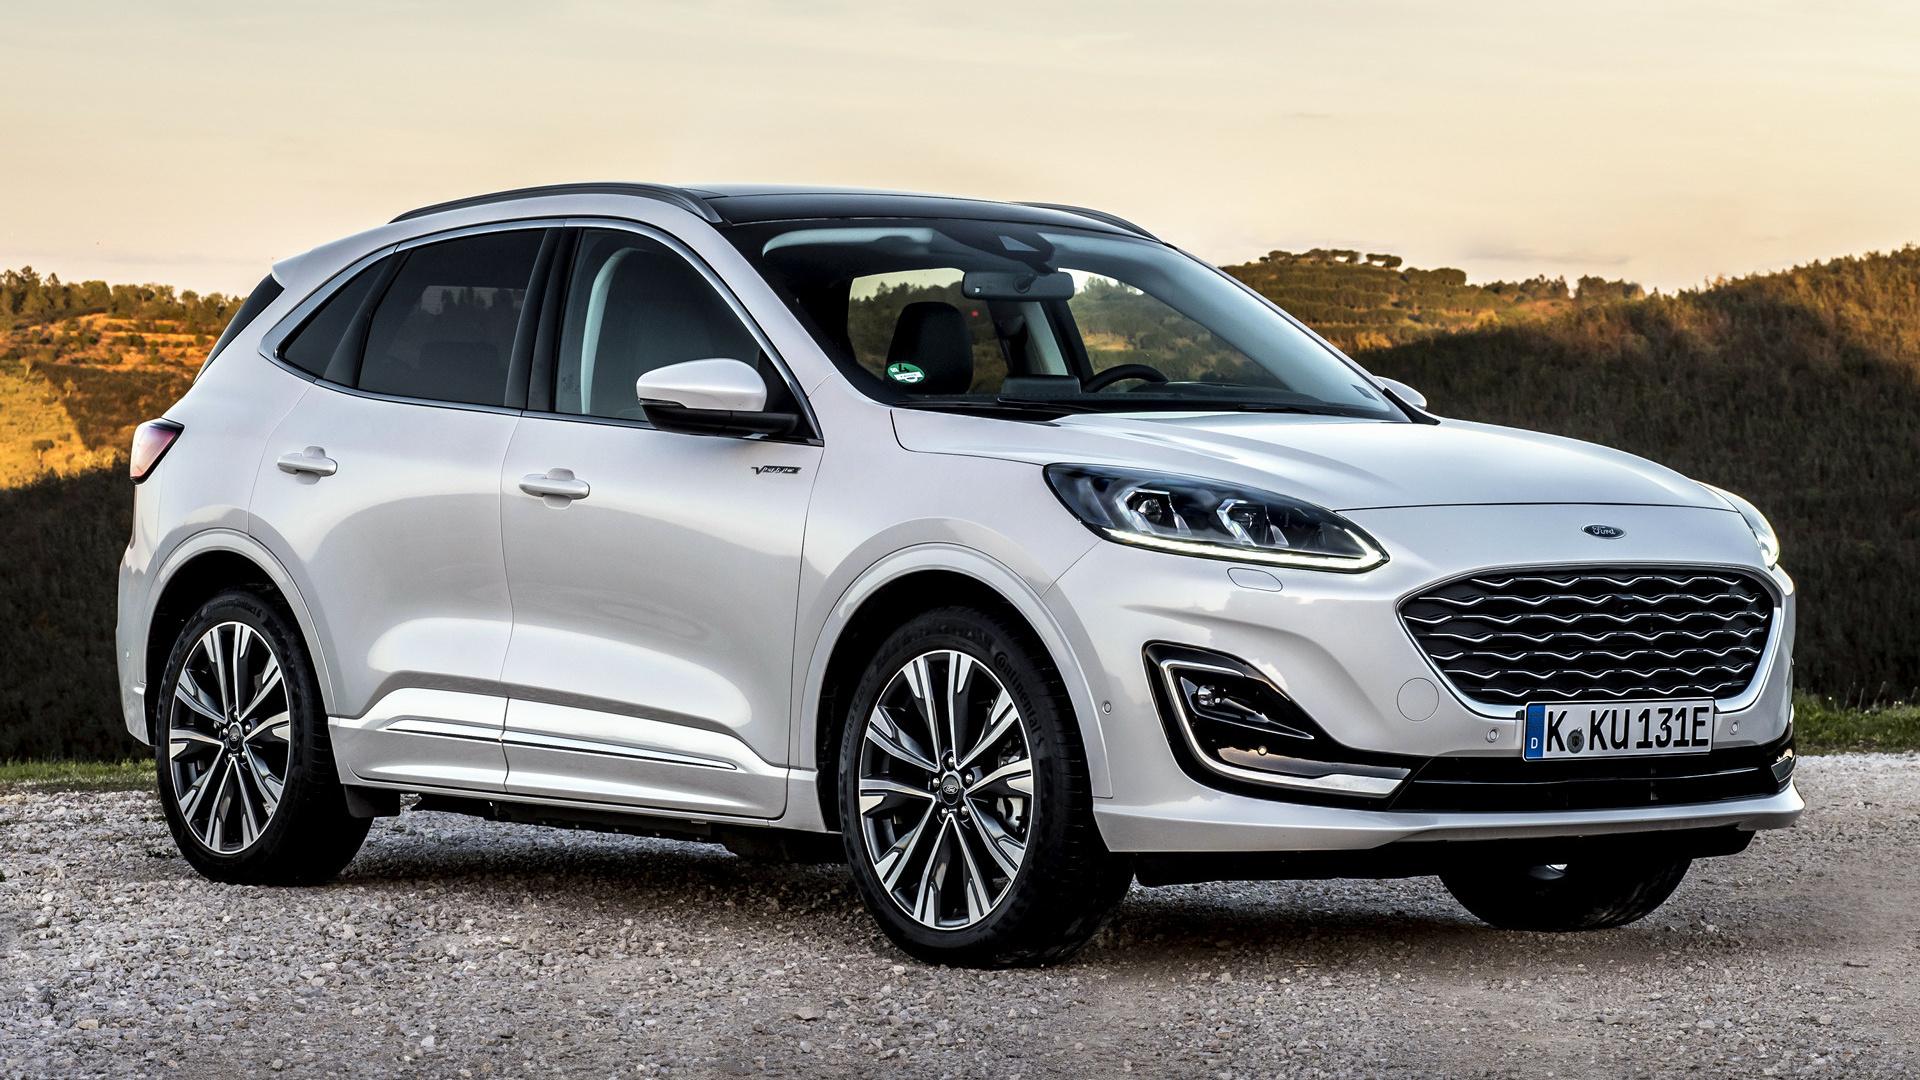 2020 Ford Kuga Vignale Plug-In Hybrid - Fonds d'écran et ...